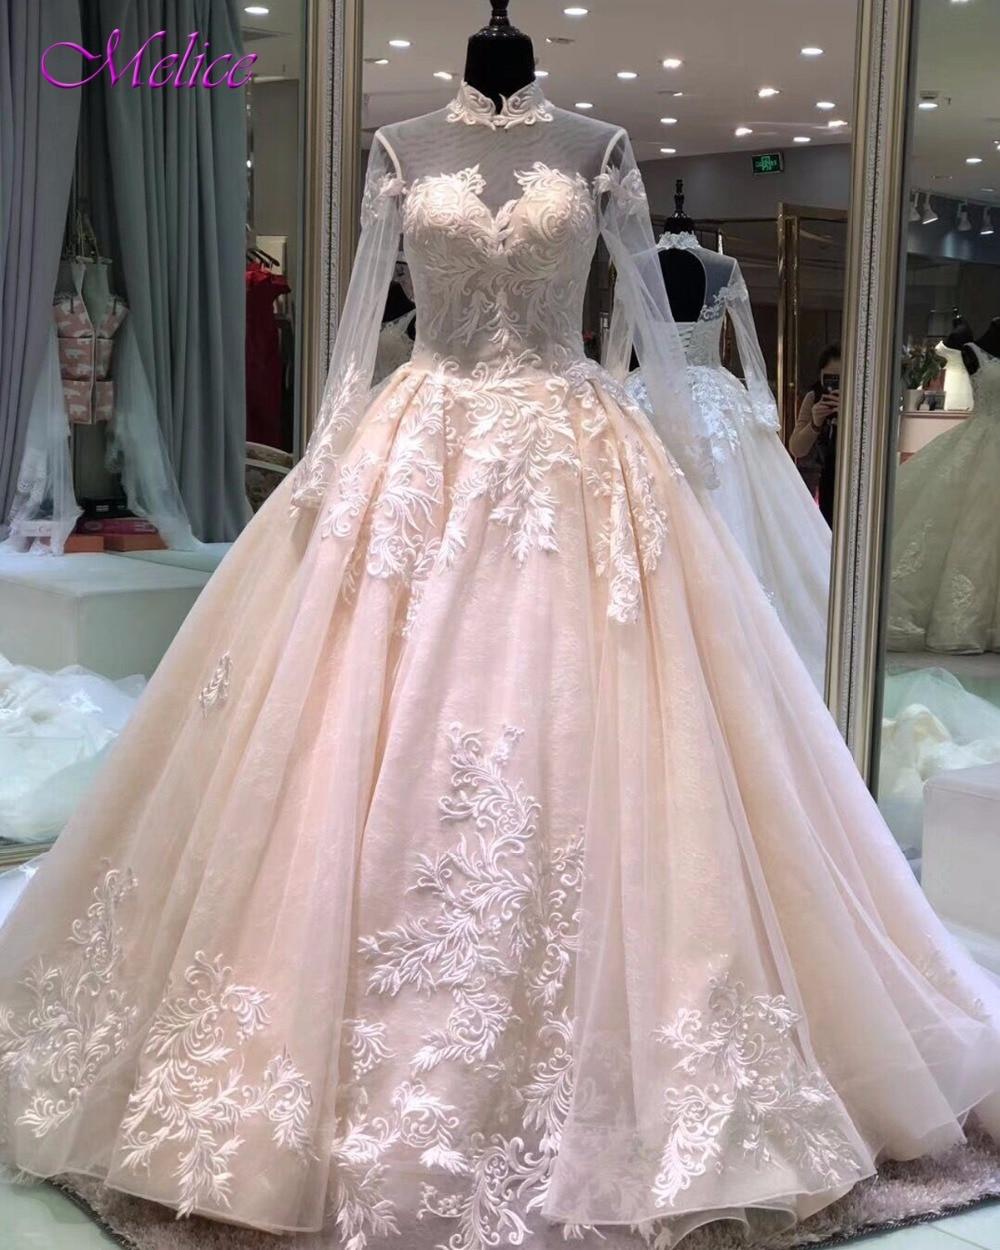 Melice Gorgeous Appliques Court Train Ball Gown Lace